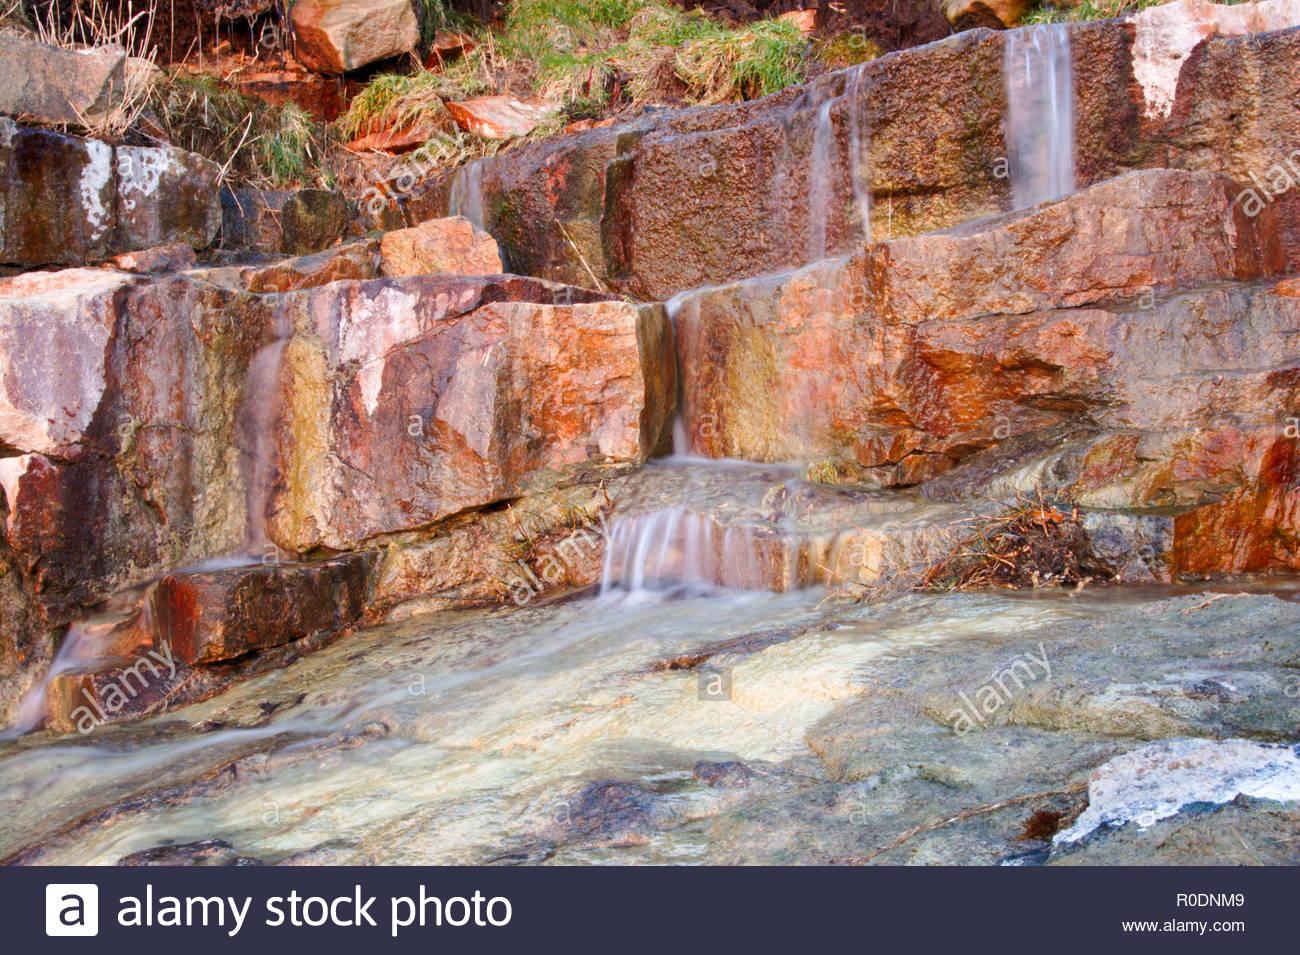 Exposed rocks of Devonian Limestone; Rinsey Cove; Cornwall; United Kingdom - Stock Image